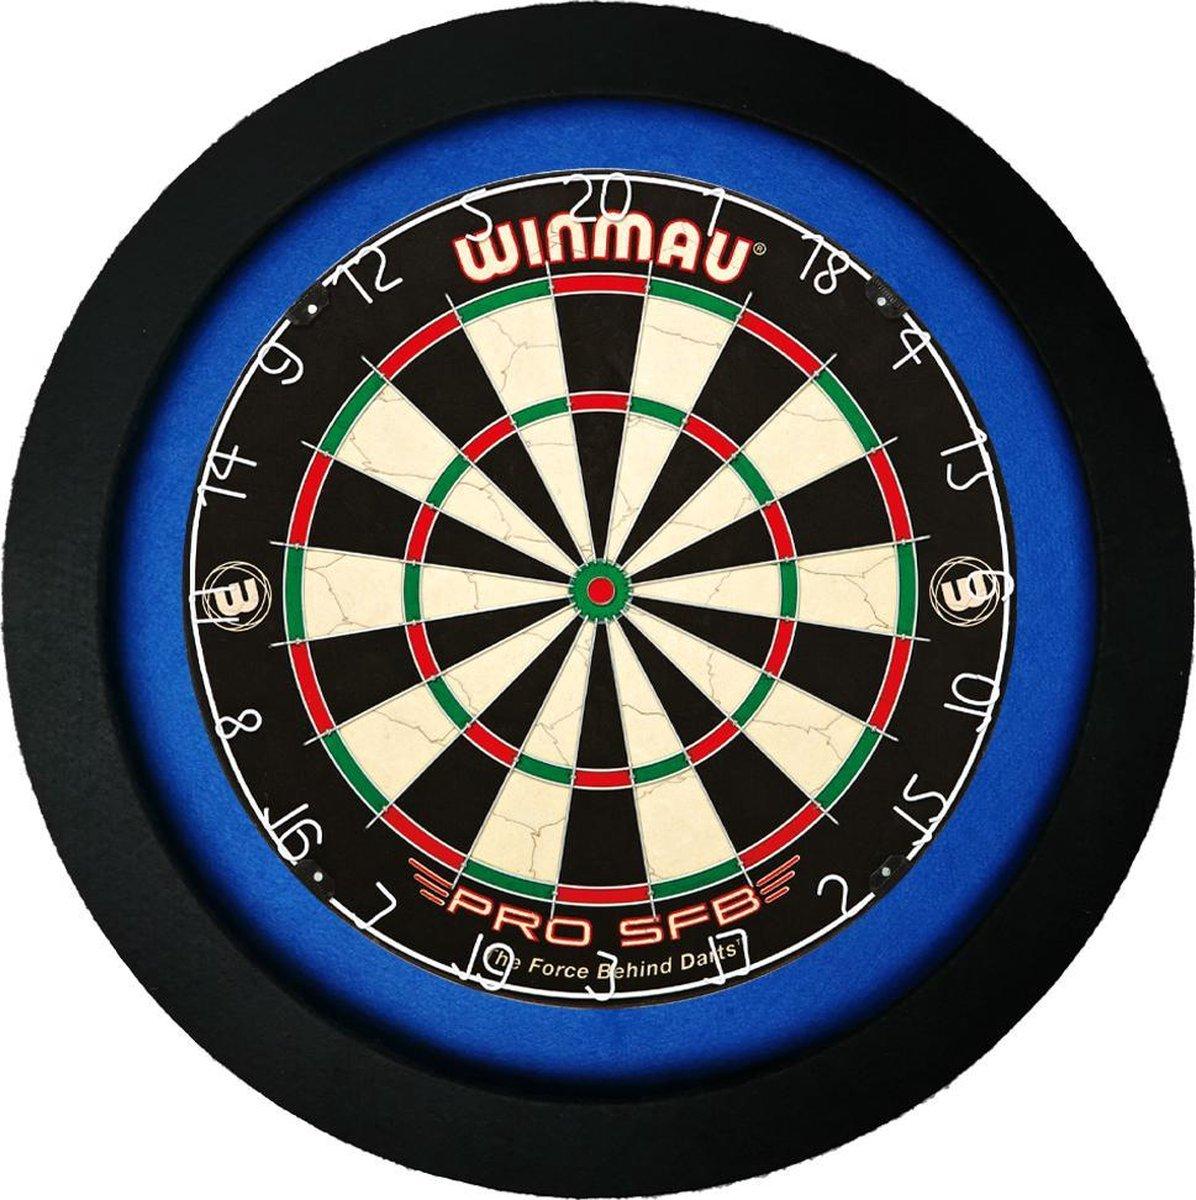 LENA Dartbord Verlichting Super Deluxe (Zwart - Blauw)